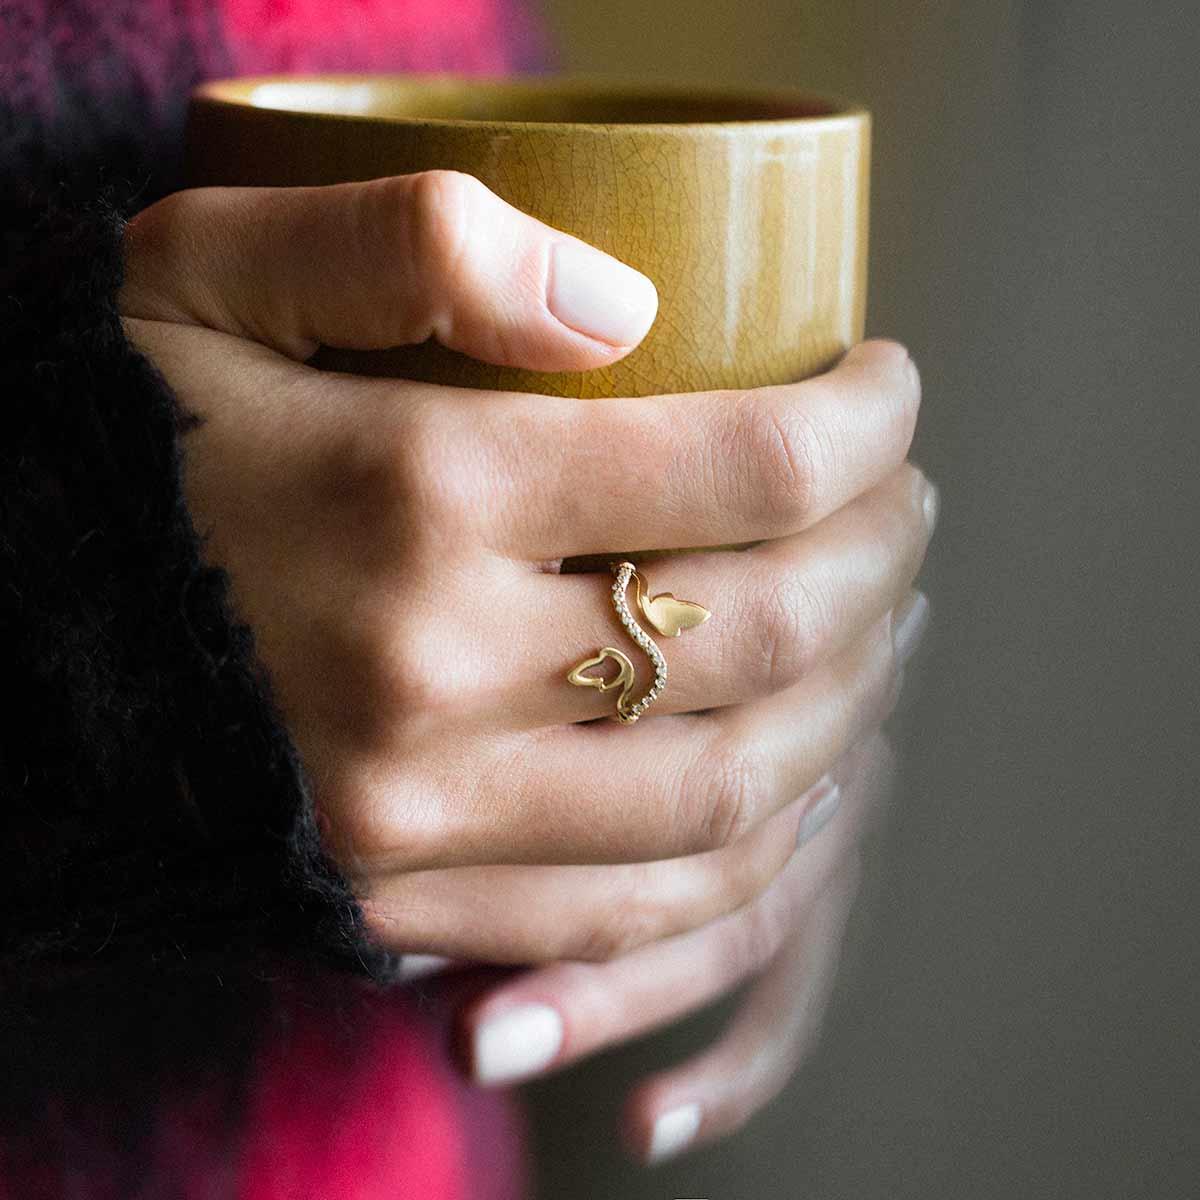 انگشتر طلا دو برگ